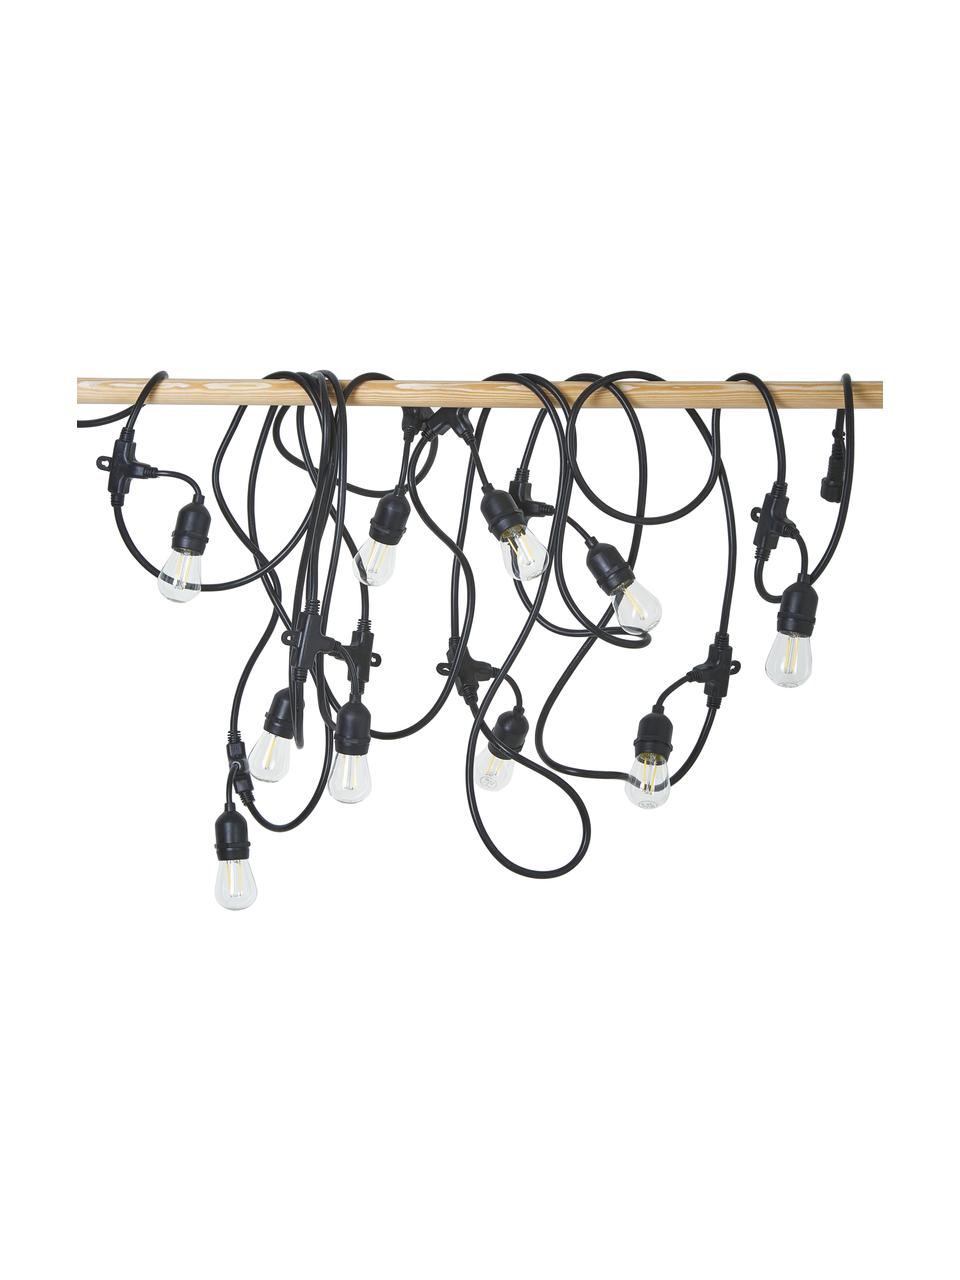 Outdoor LED-Lichterkette Joy, 1000 cm, 10 Lampions, Lampions: Kunststoff, Schwarz, L 1000 cm